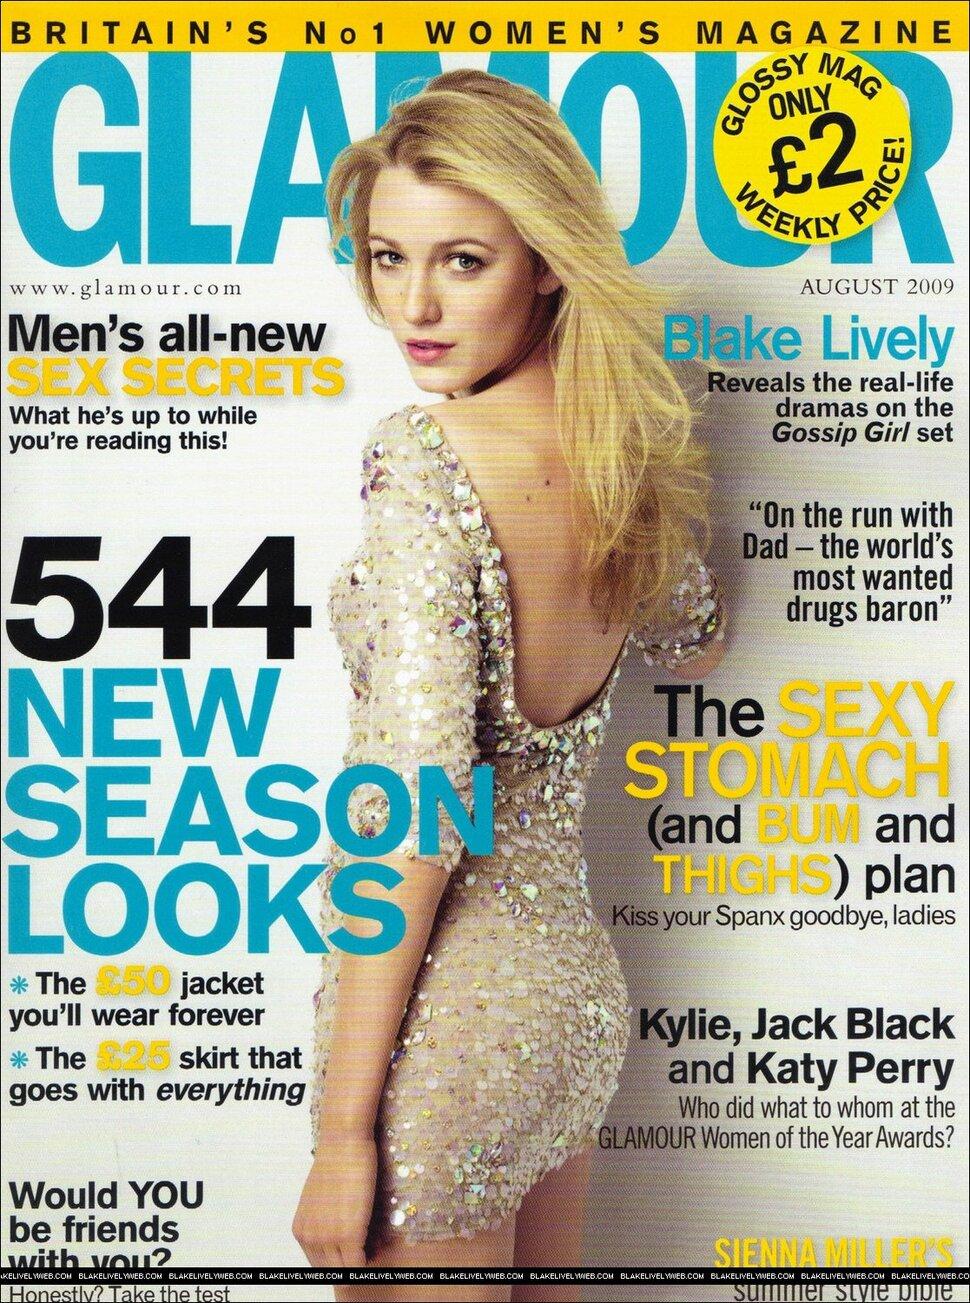 Блэйк Лайвли в журнале Glamour. Великобритания. Август 2009